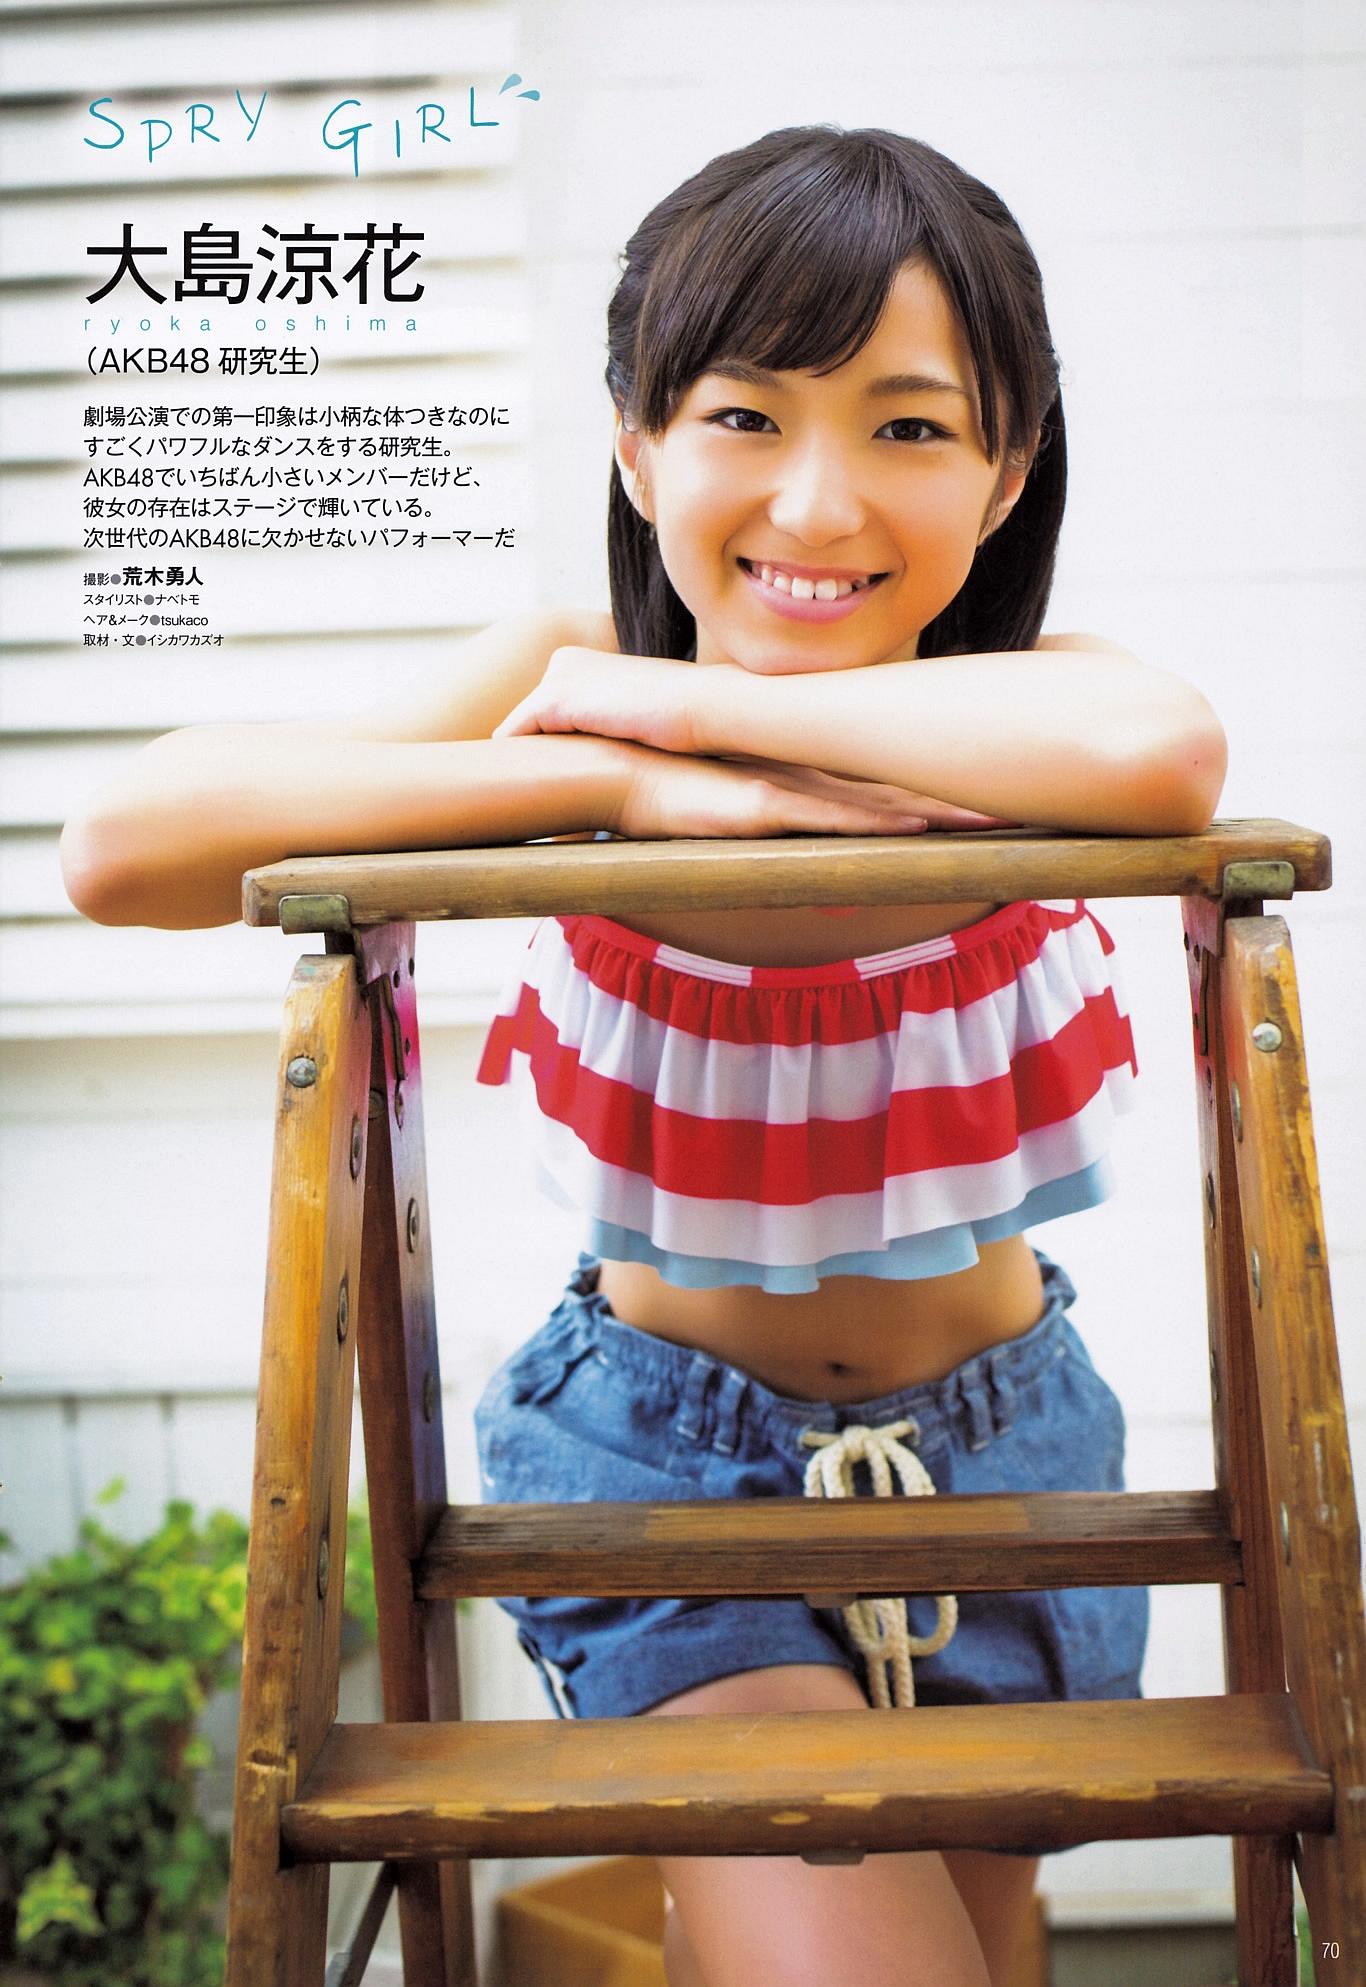 Oshima Ryoka - AKB48 - Asiachan KPOP Image Board